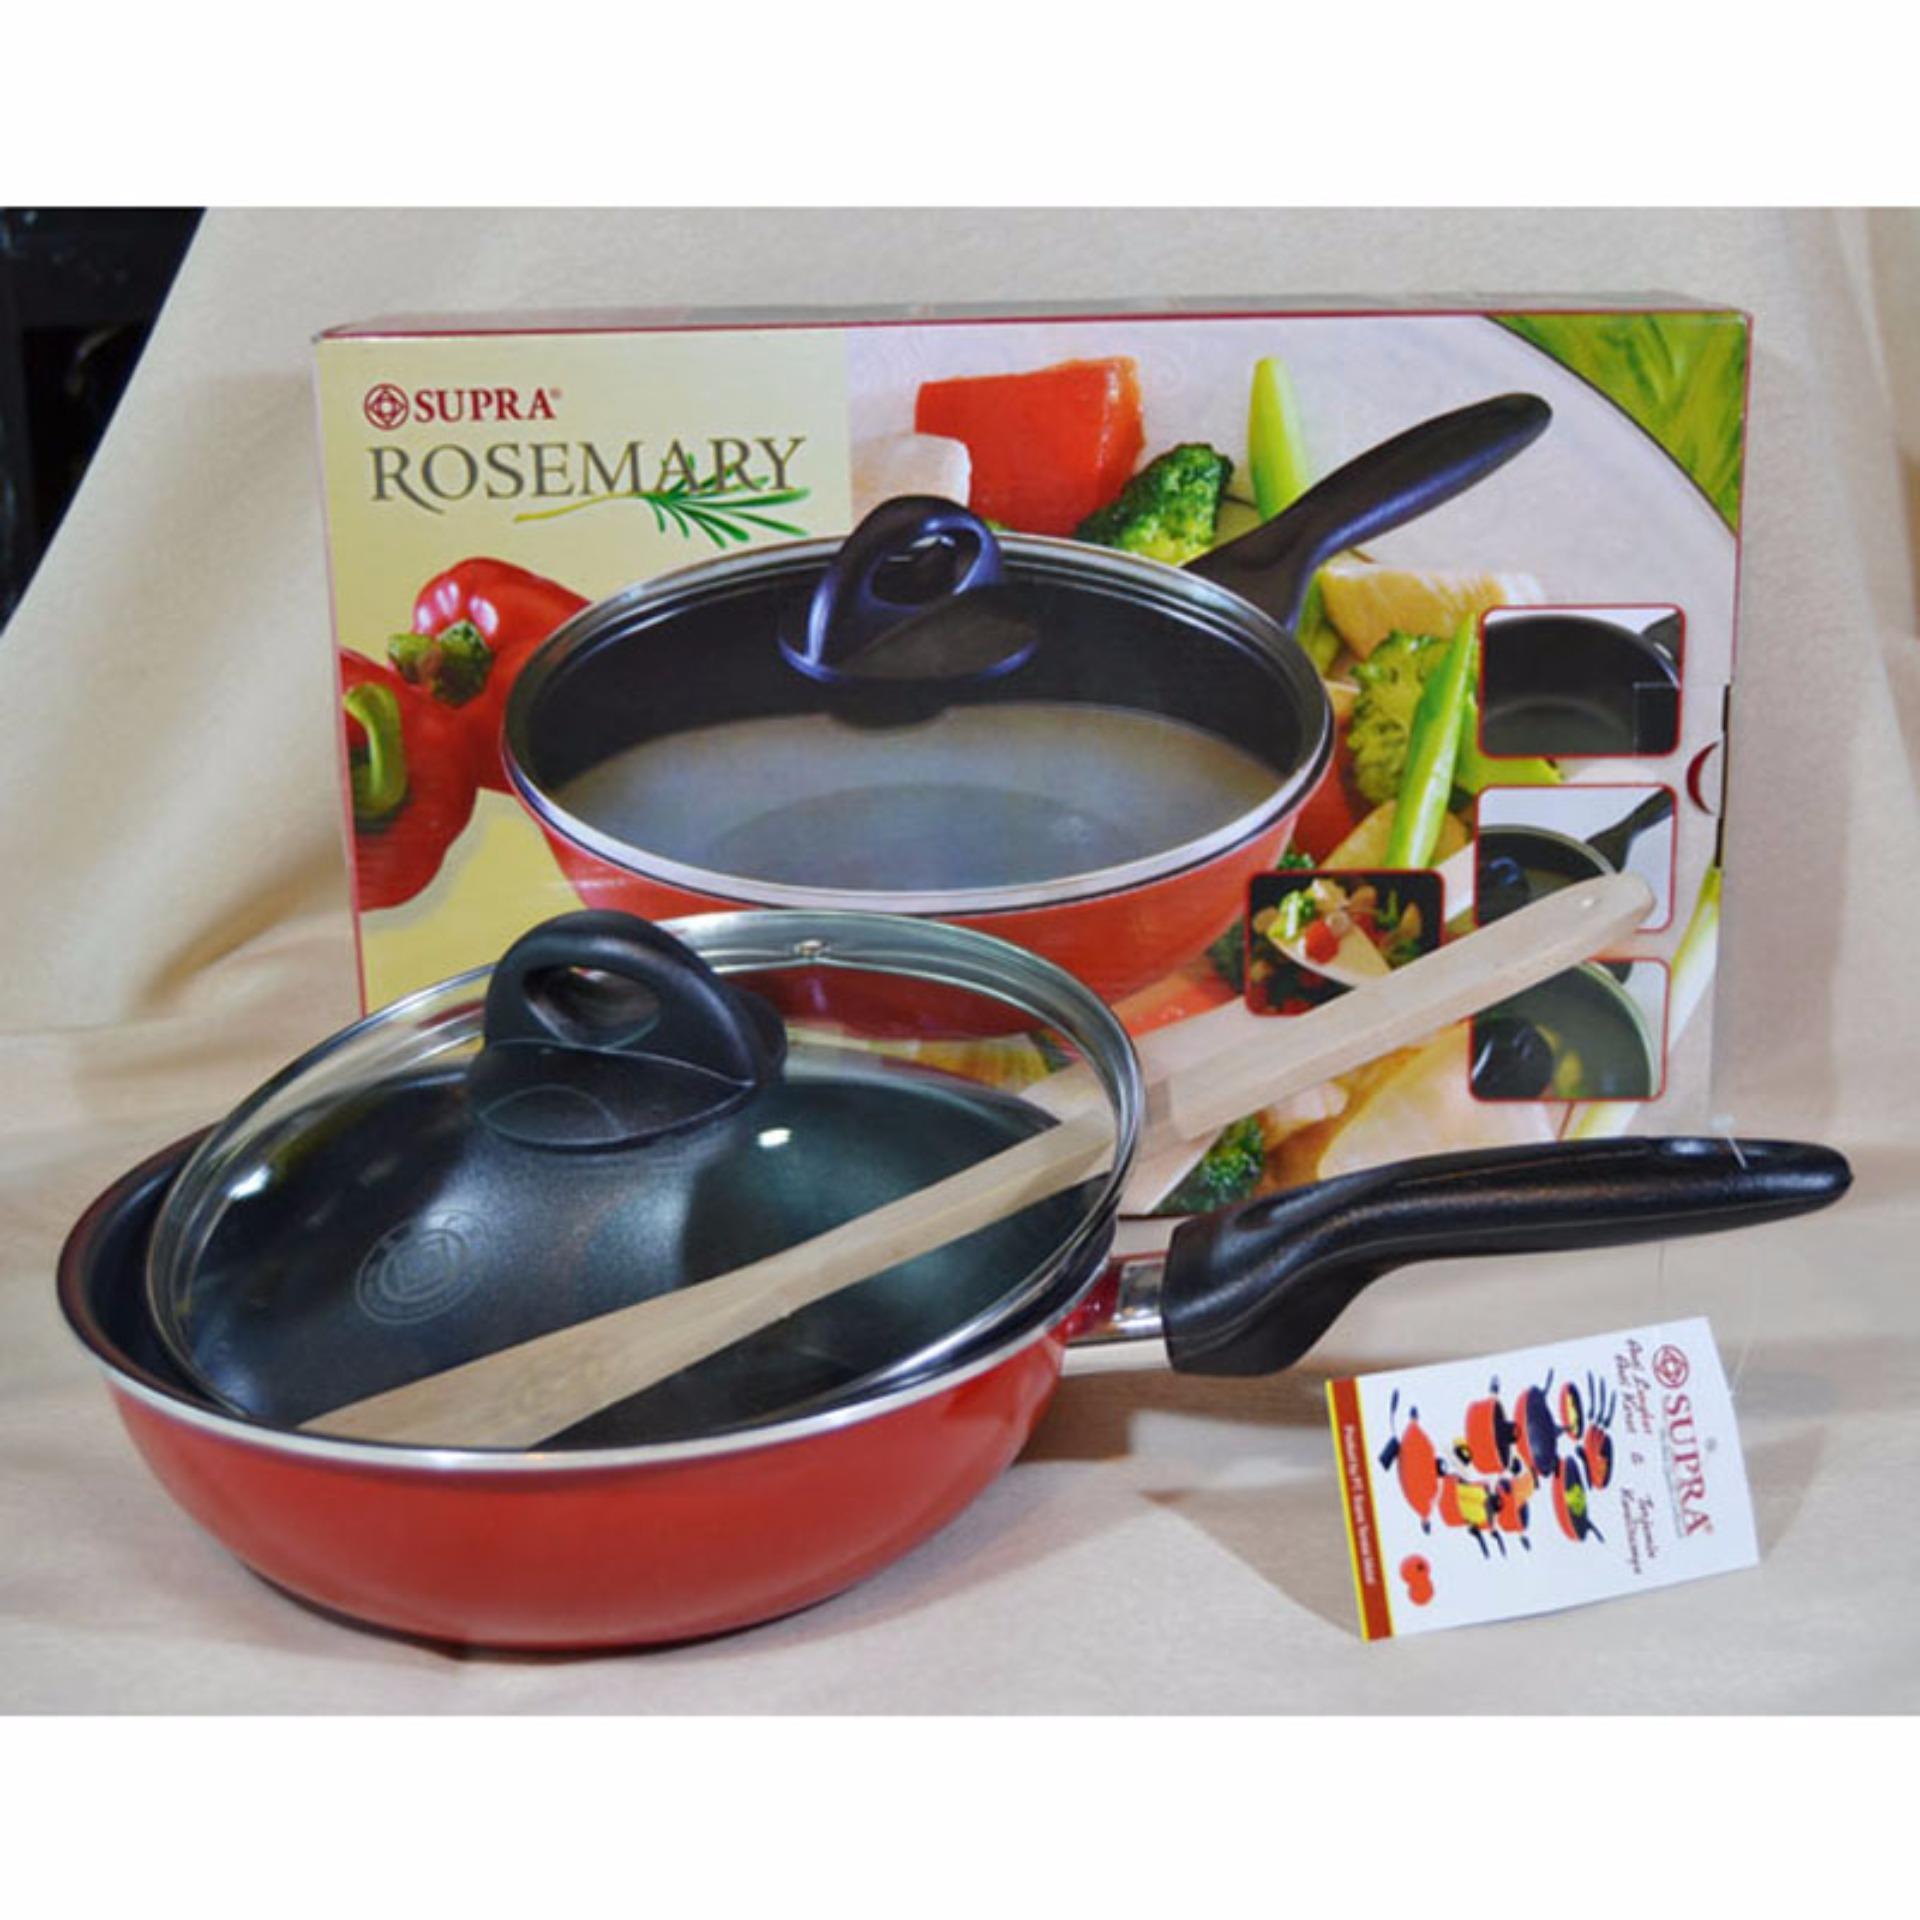 Tips Beli Supra Rosemary Non Stick Stir Pan Lid Spatula 22 Cm